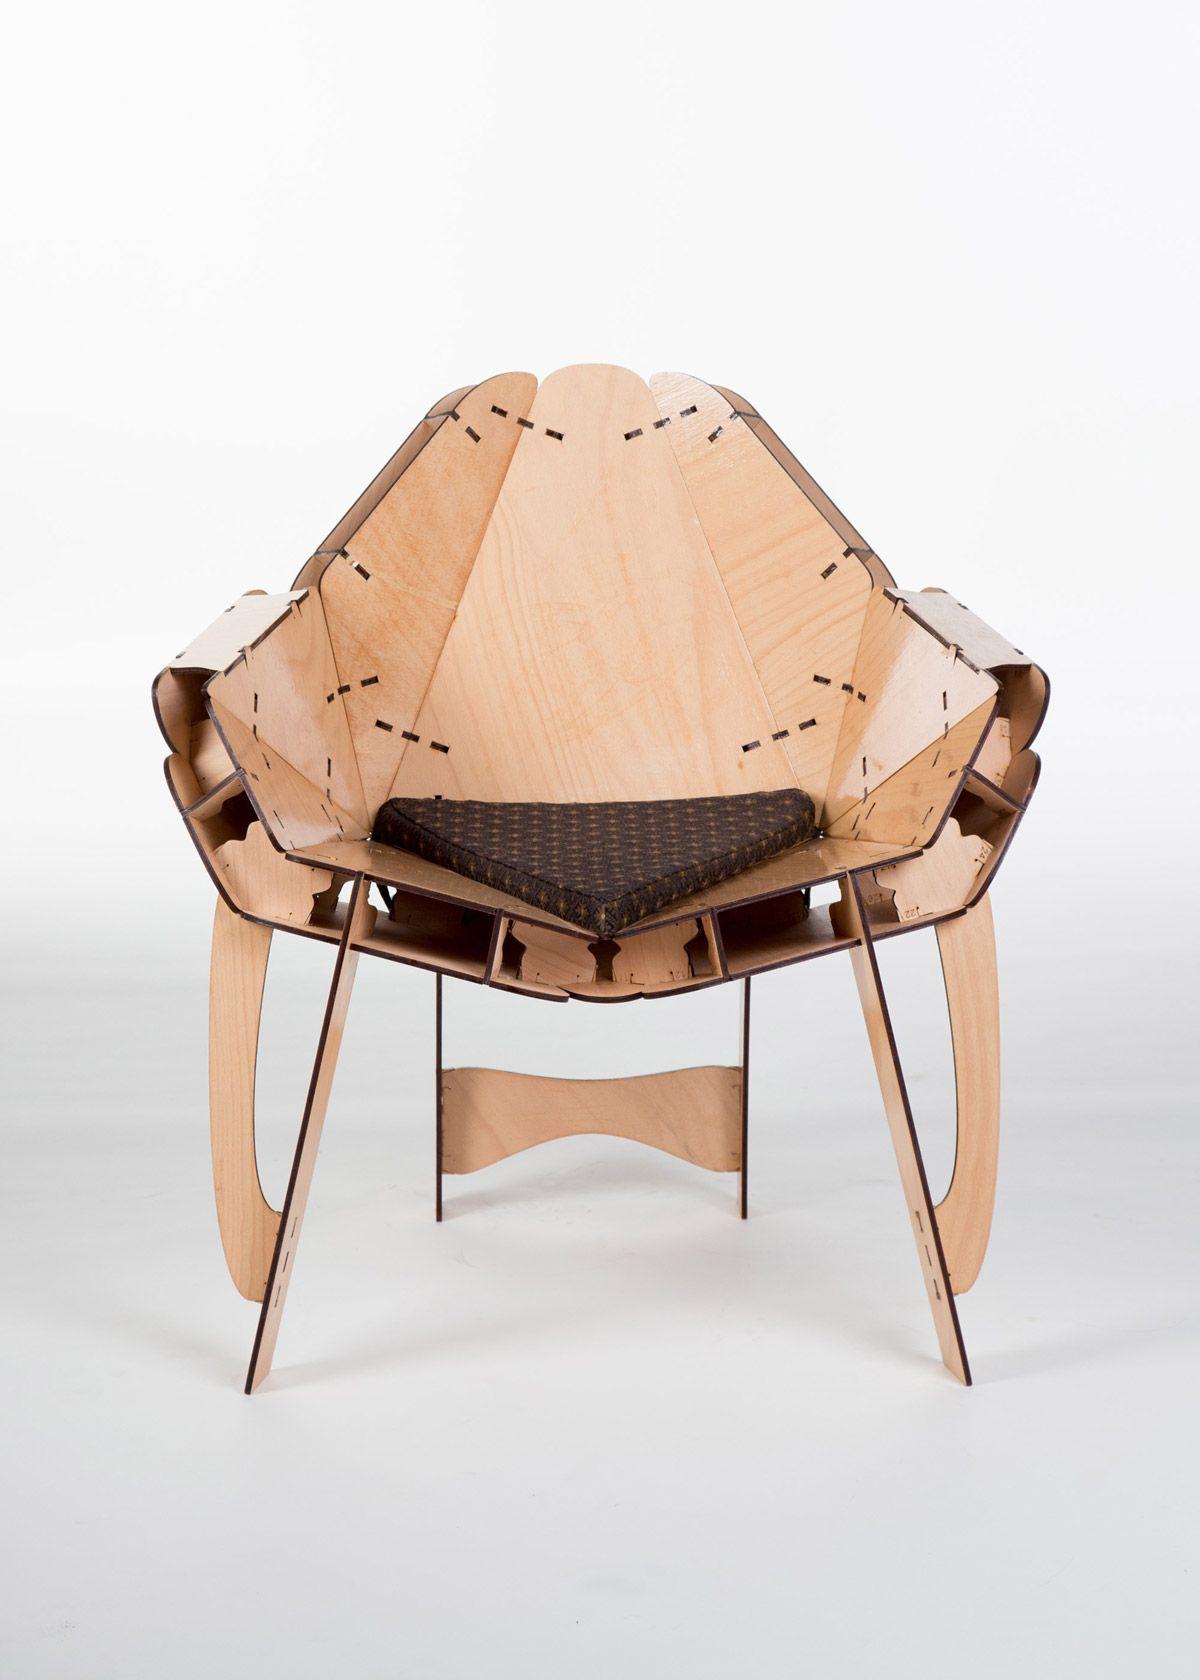 U201cFreeformu201d 3D Puzzle Furniture Design By Portik Adorján